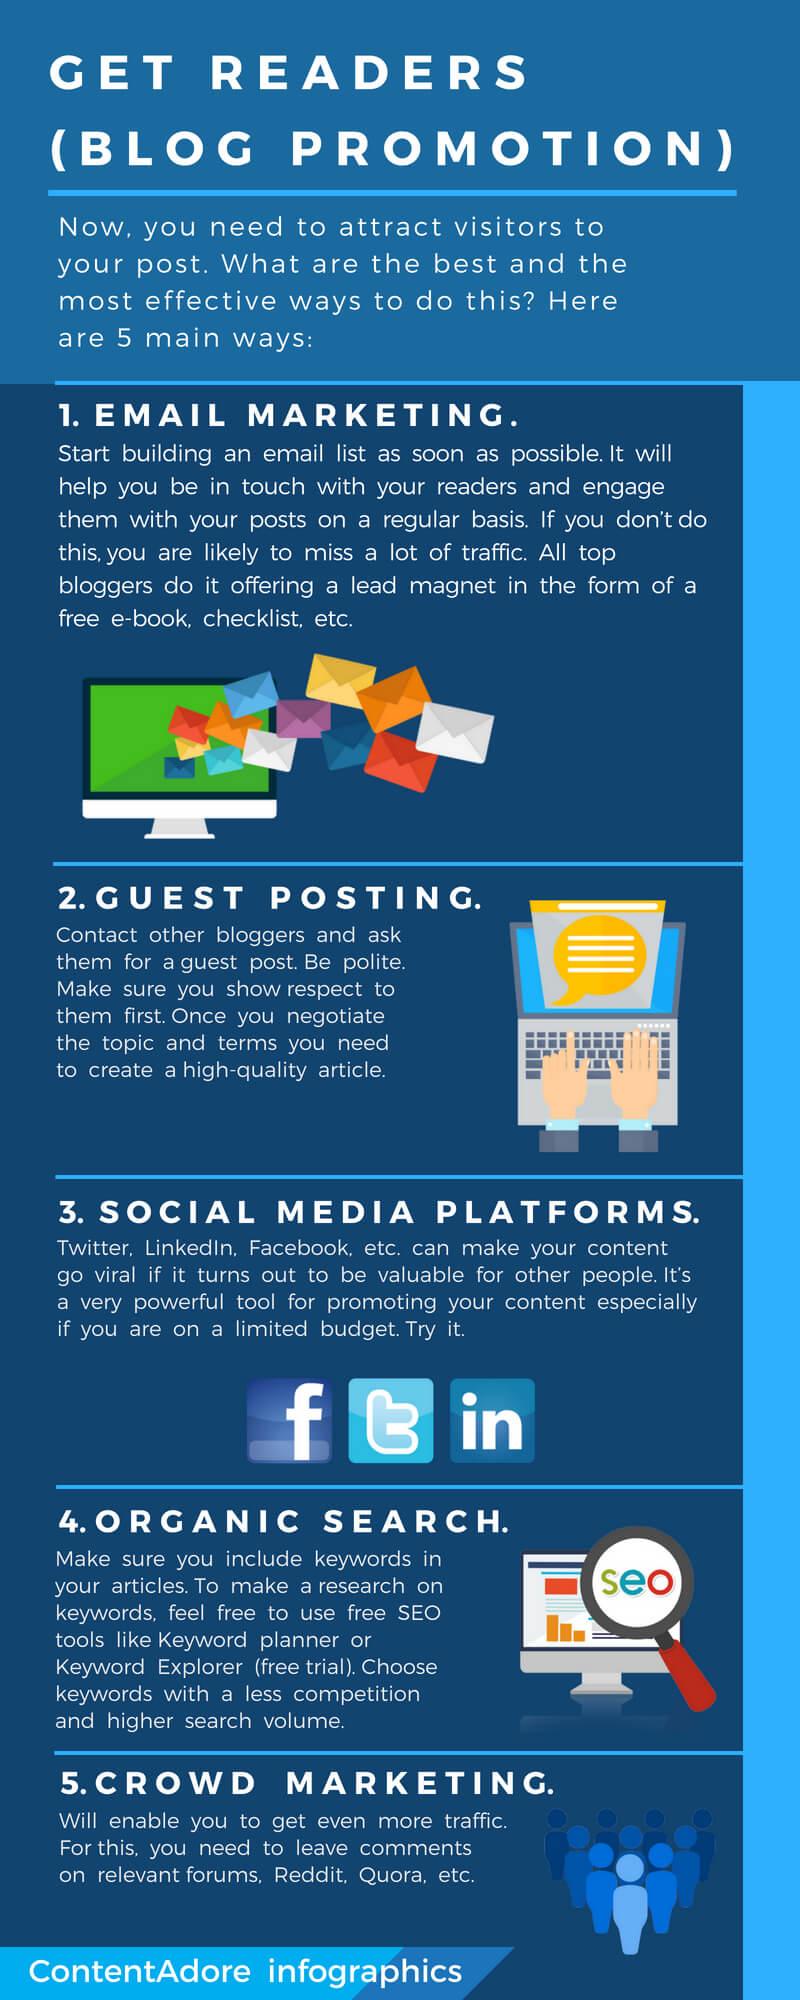 Image Infographics - Get Readers Blog Promotion